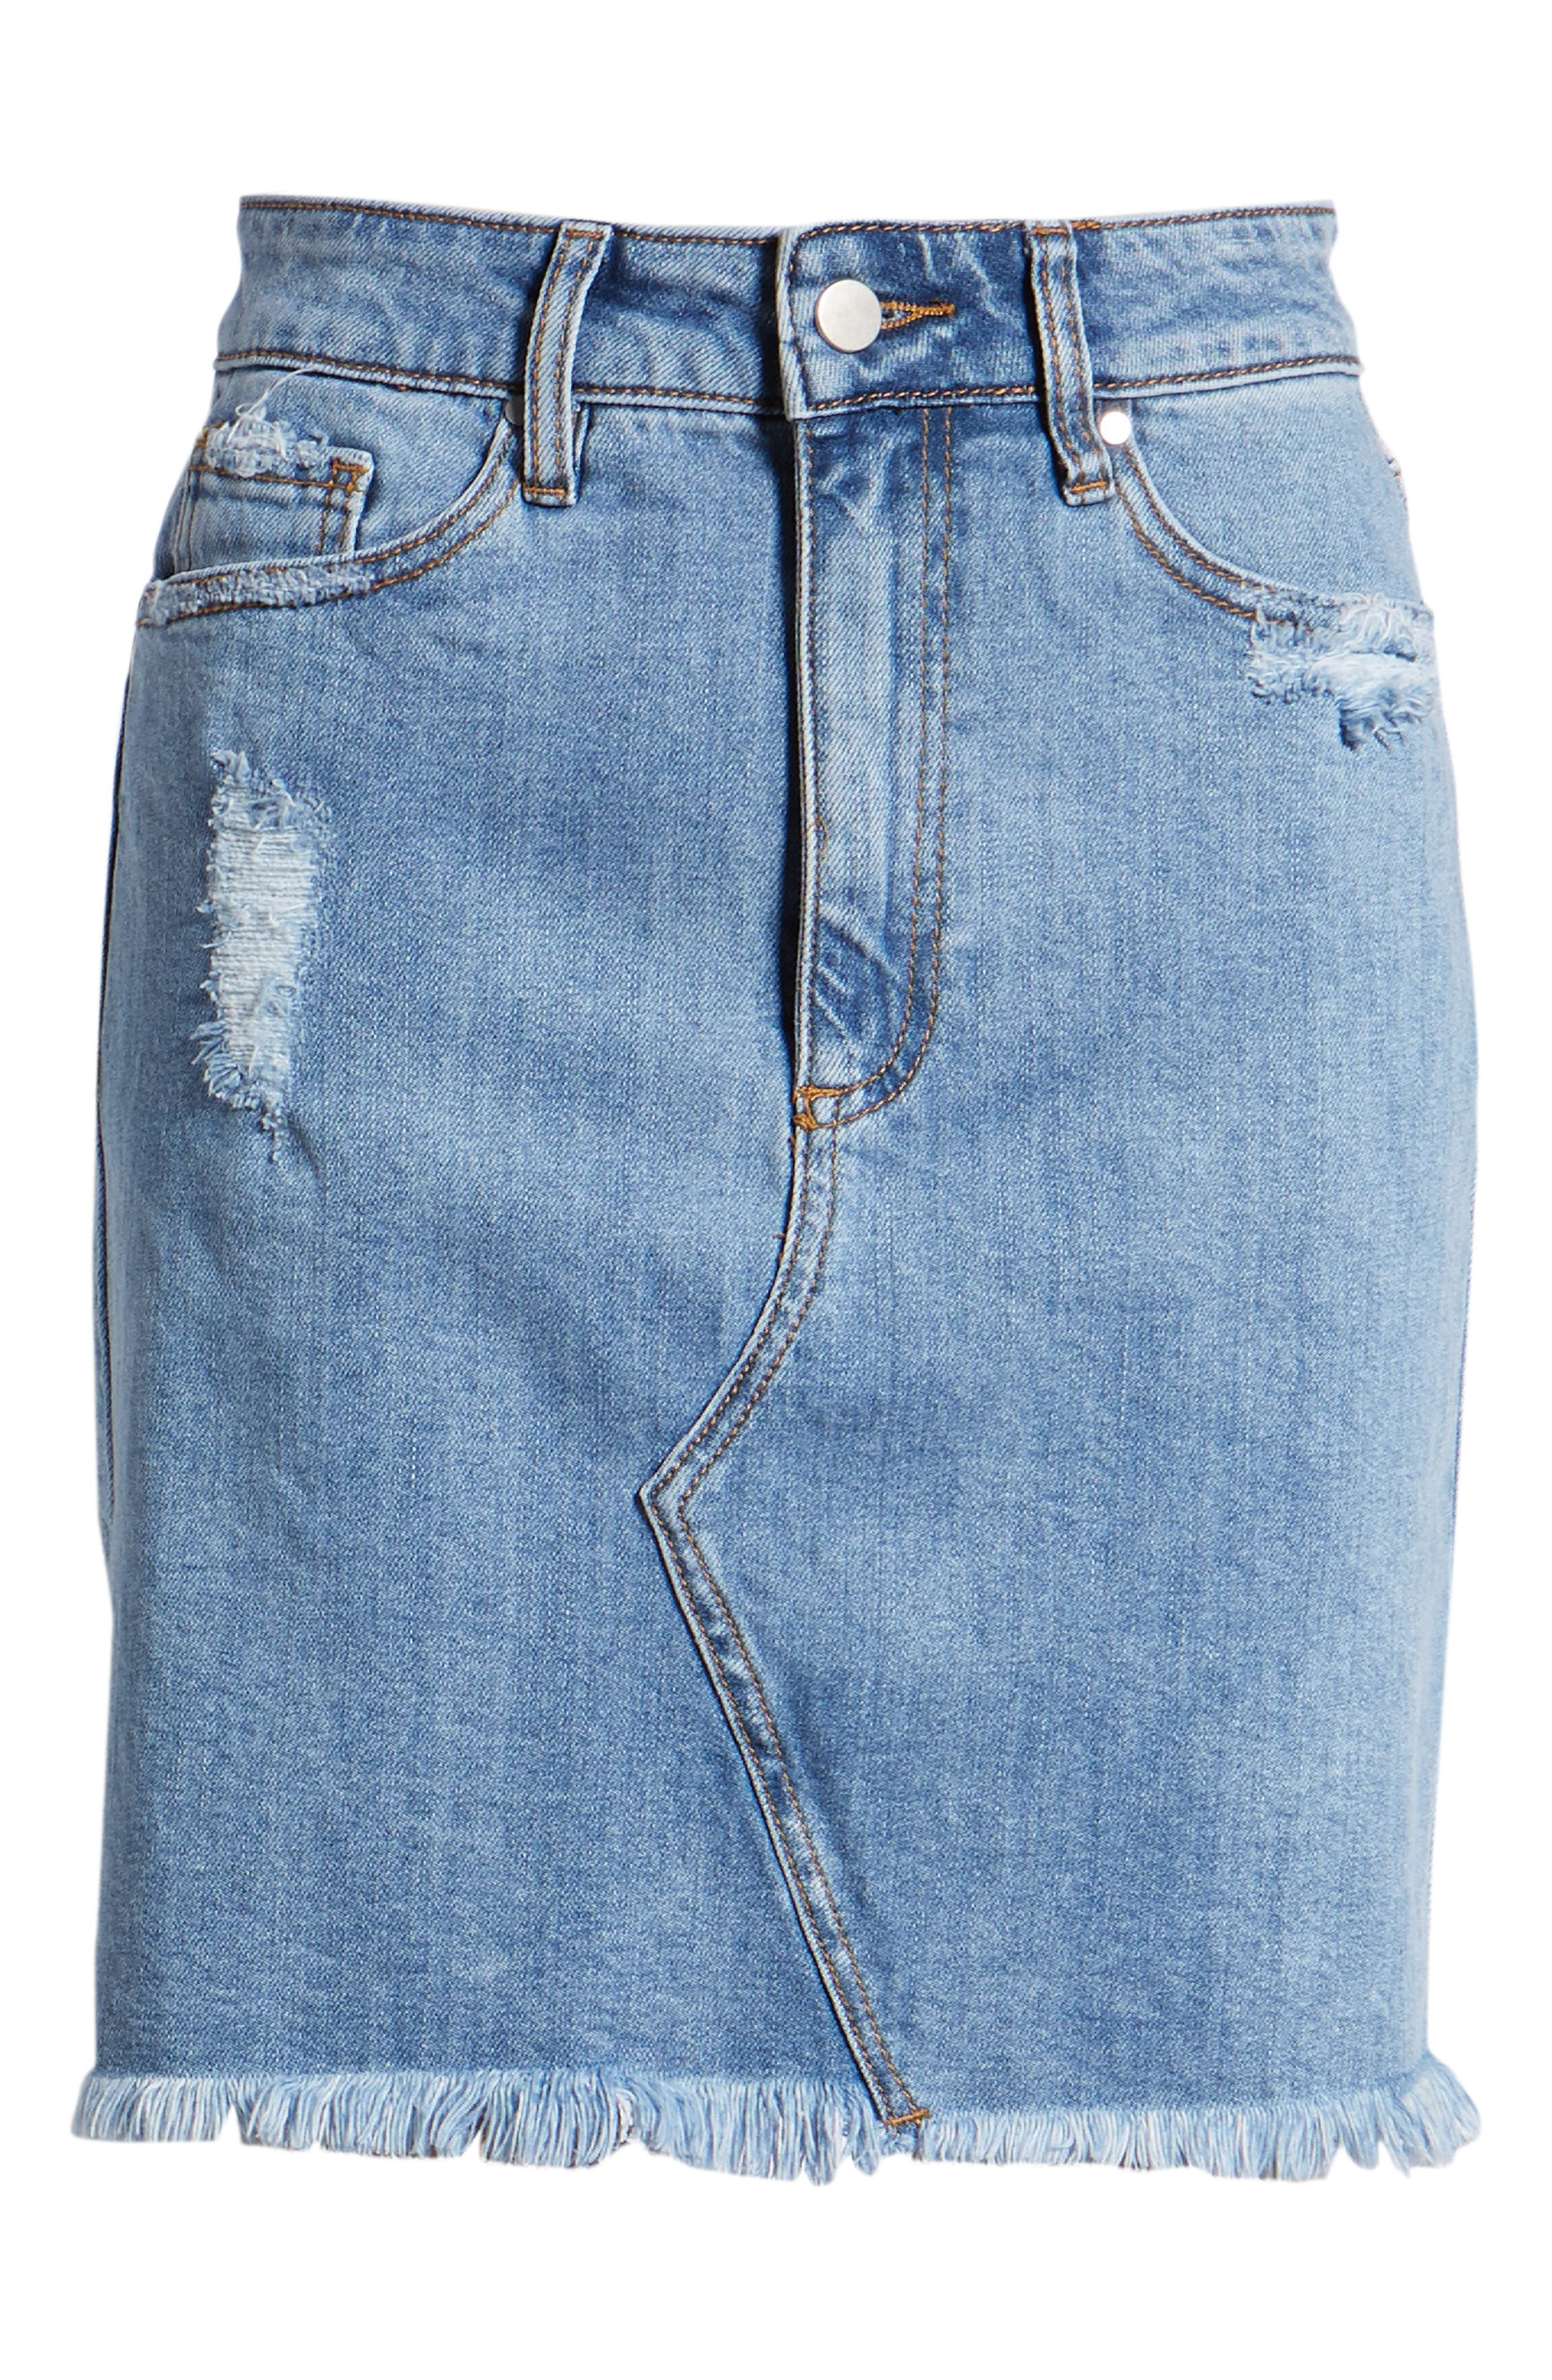 Distressed Denim Skirt,                             Alternate thumbnail 7, color,                             Light Wash